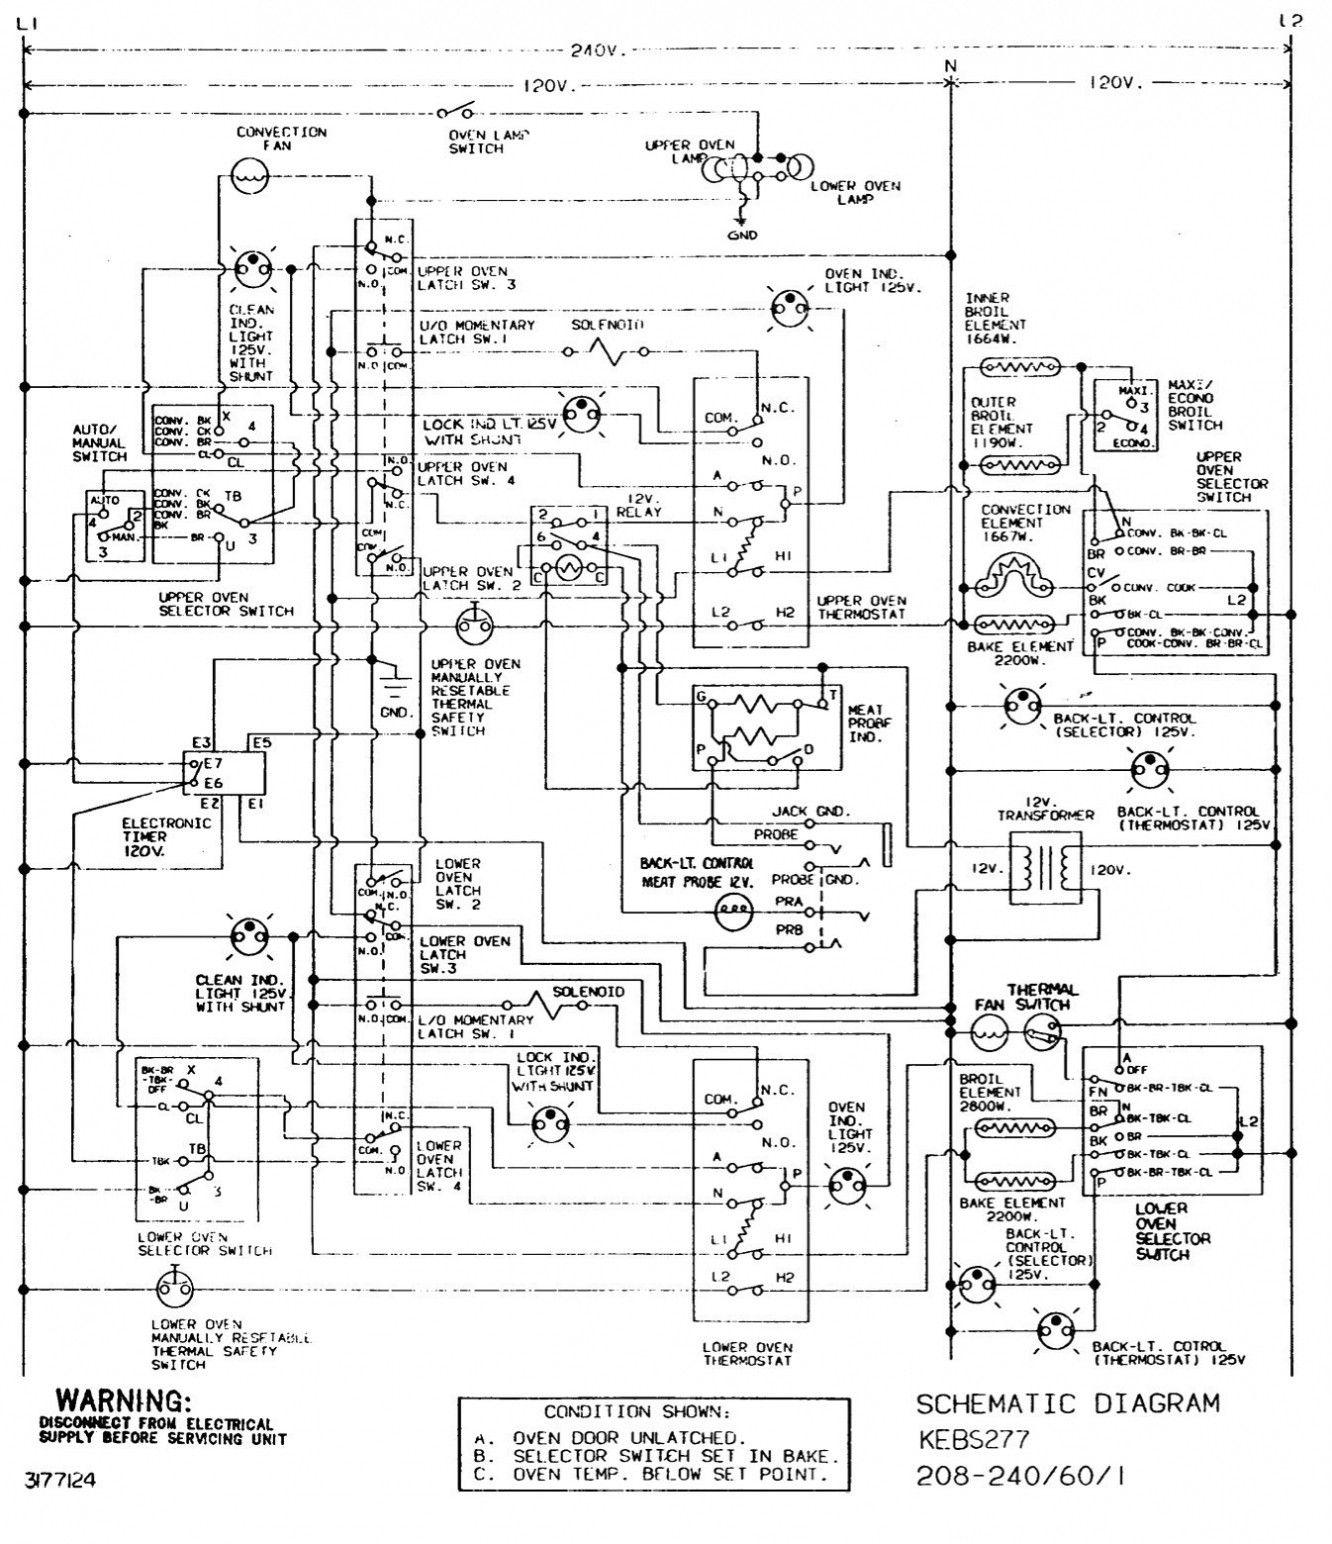 Wiring Diagram Car Wash Diagram Diagramtemplate Diagramsample Check More At Https Servisi Co Wiring Diagram Car Was Diagram Electrical Wiring Diagram Wire